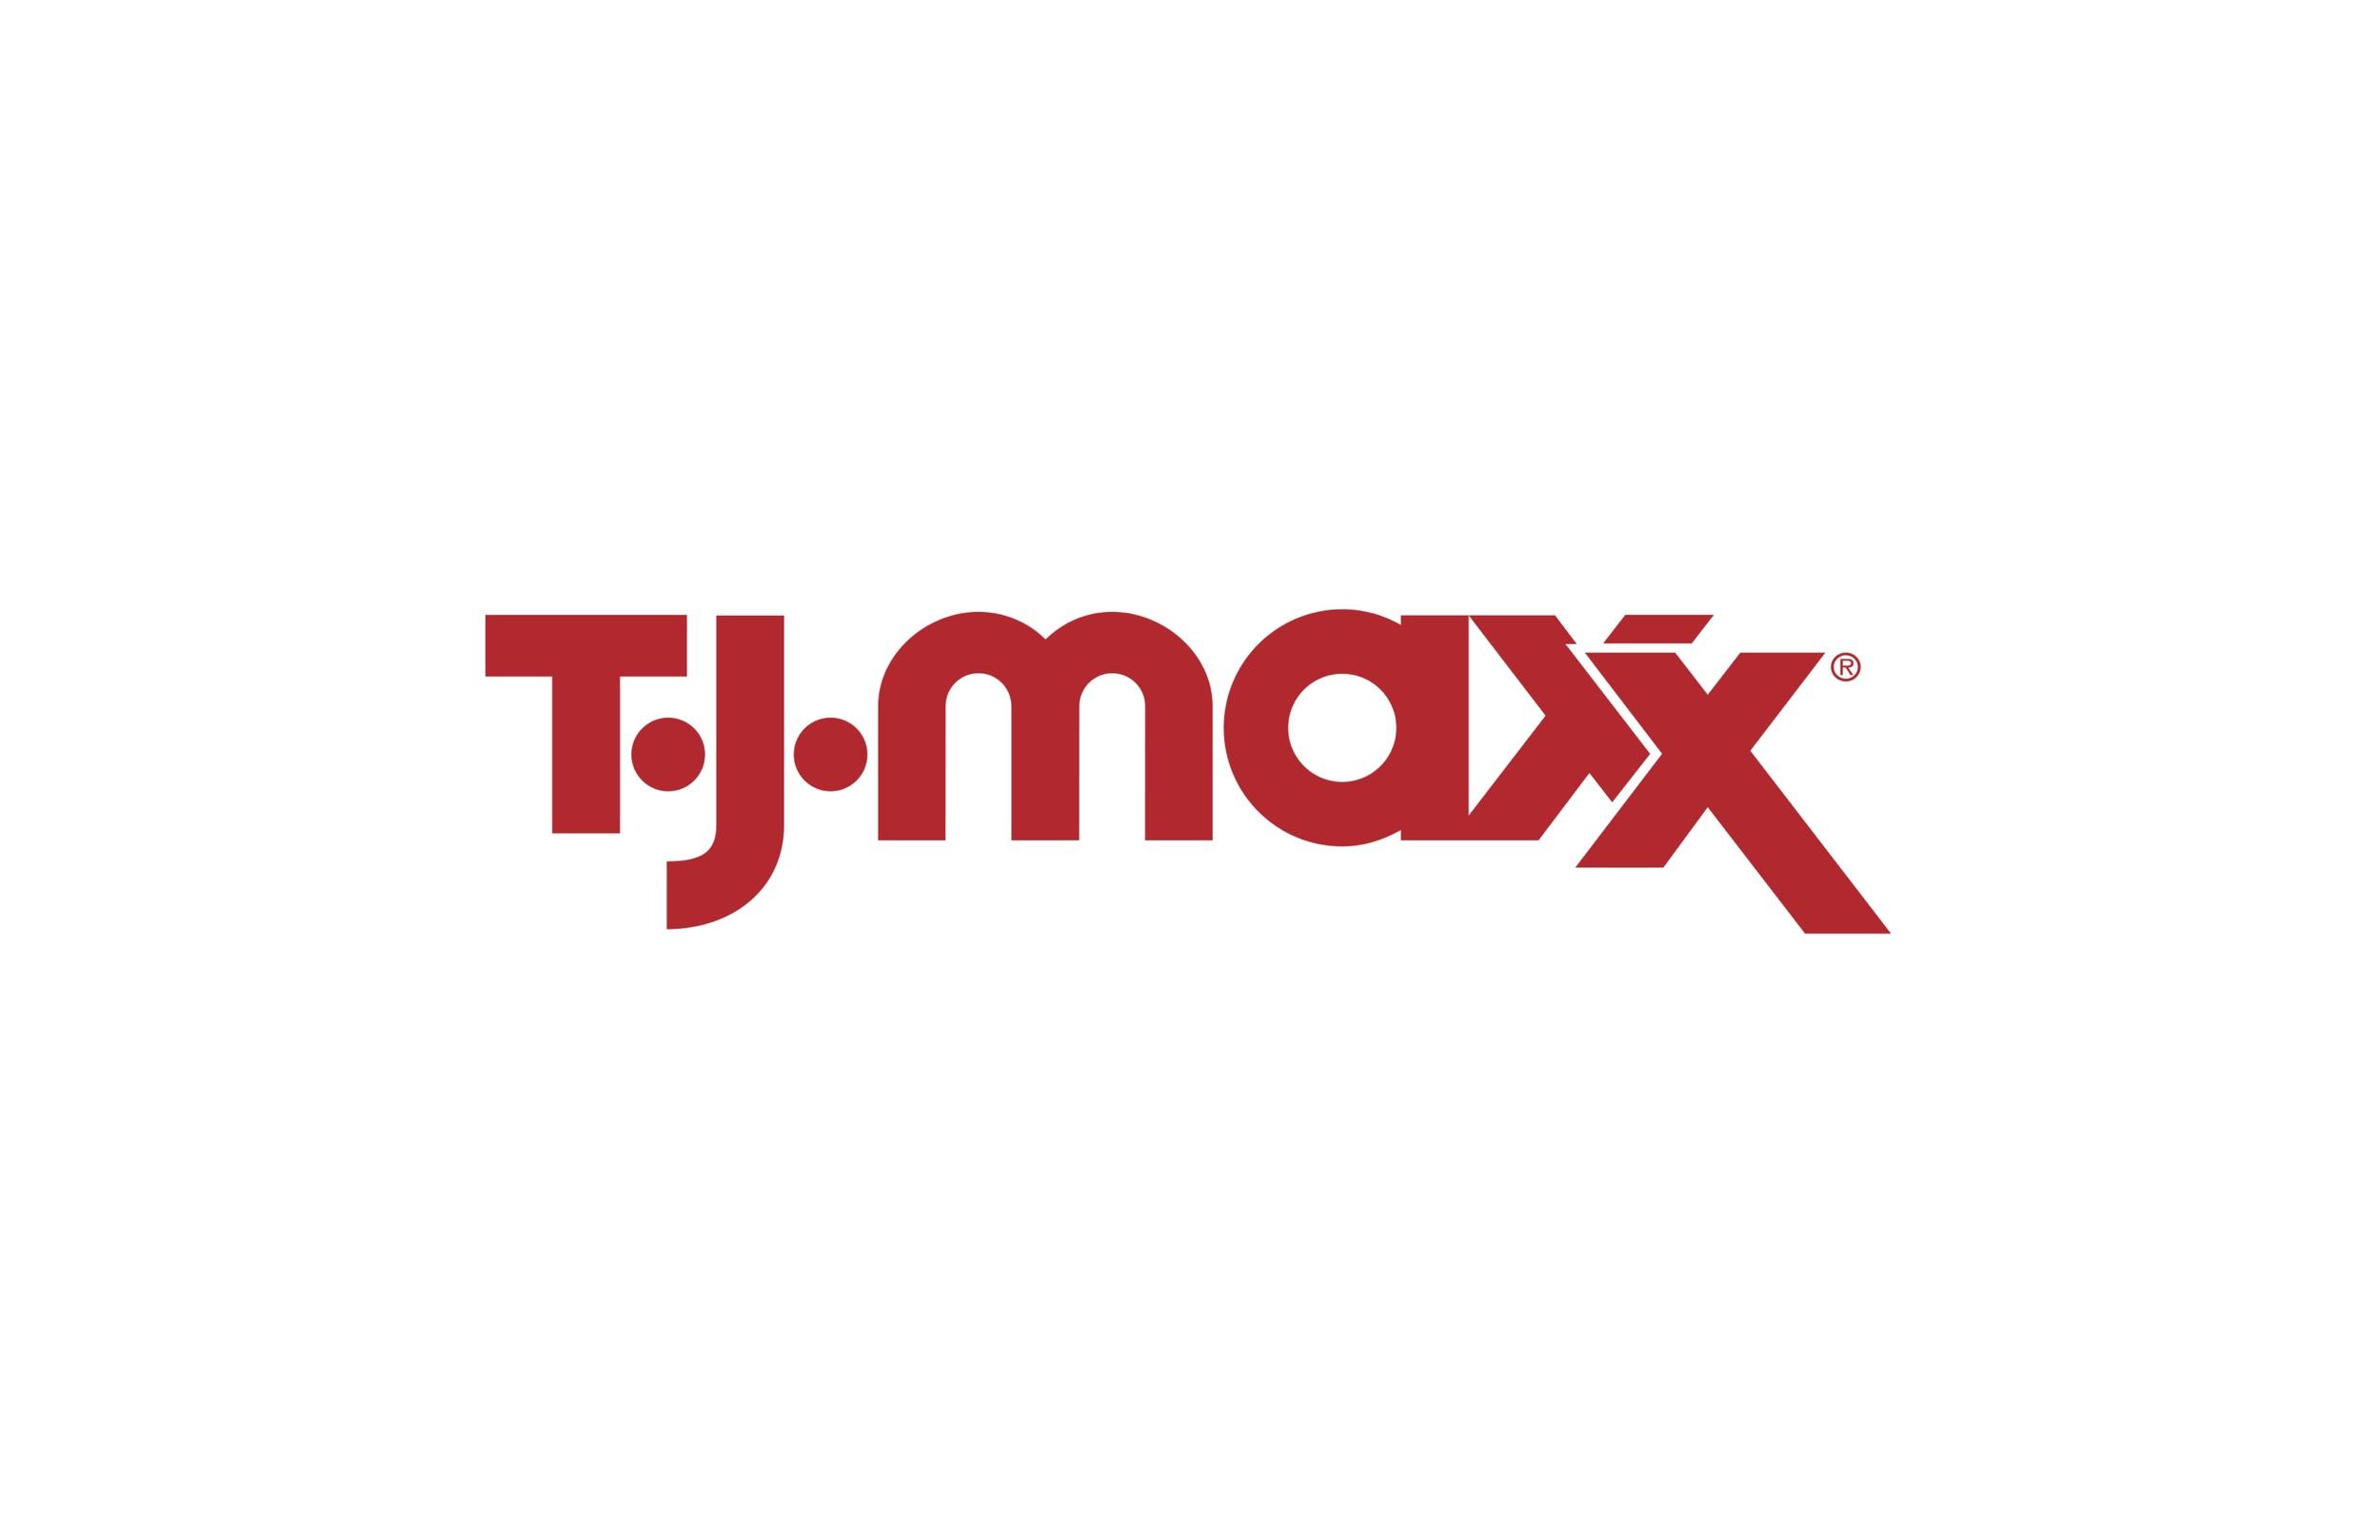 tjmaxx portcover.jpg